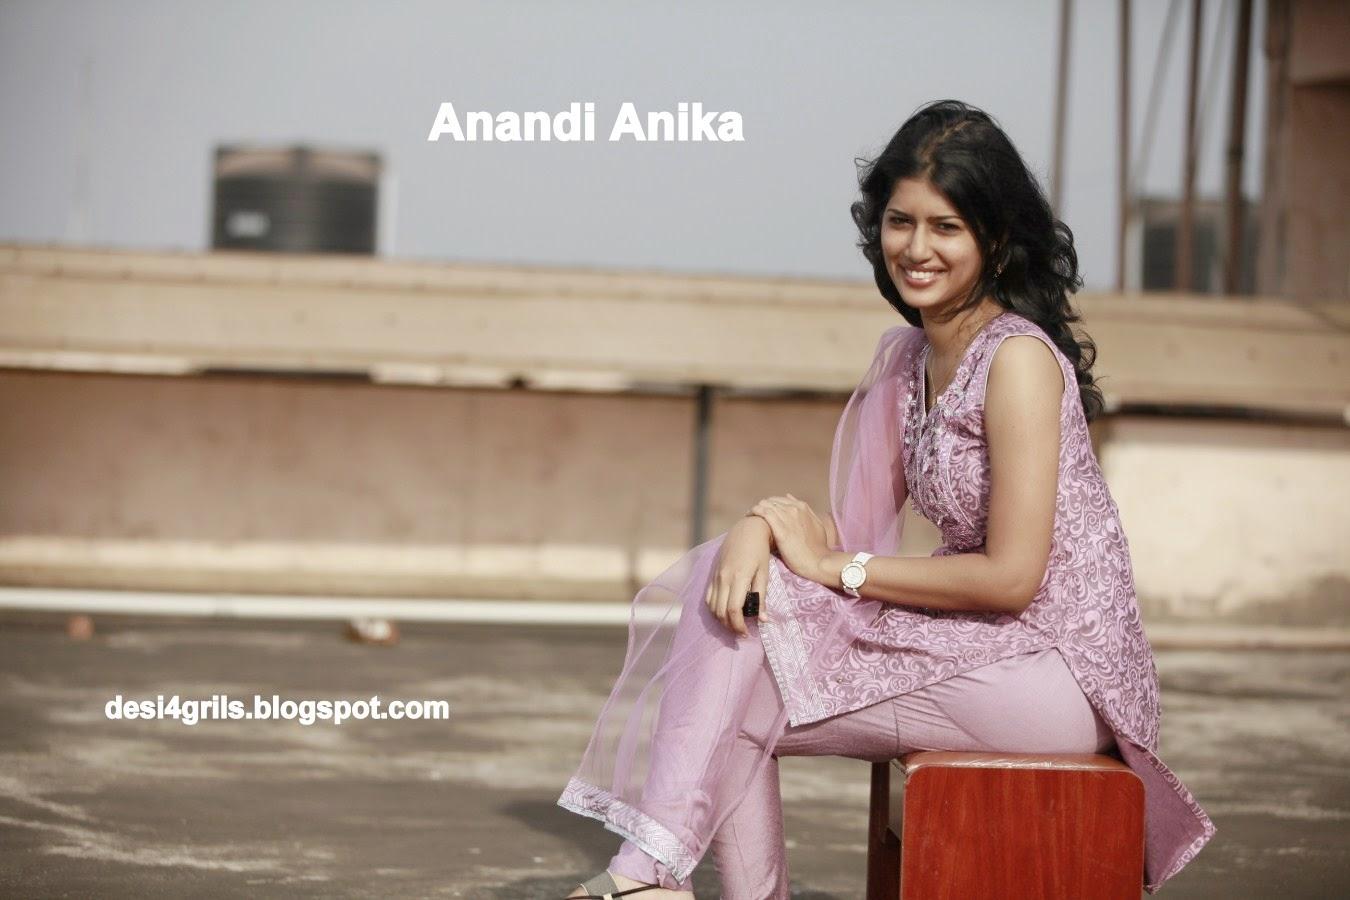 Desi scene pics 38